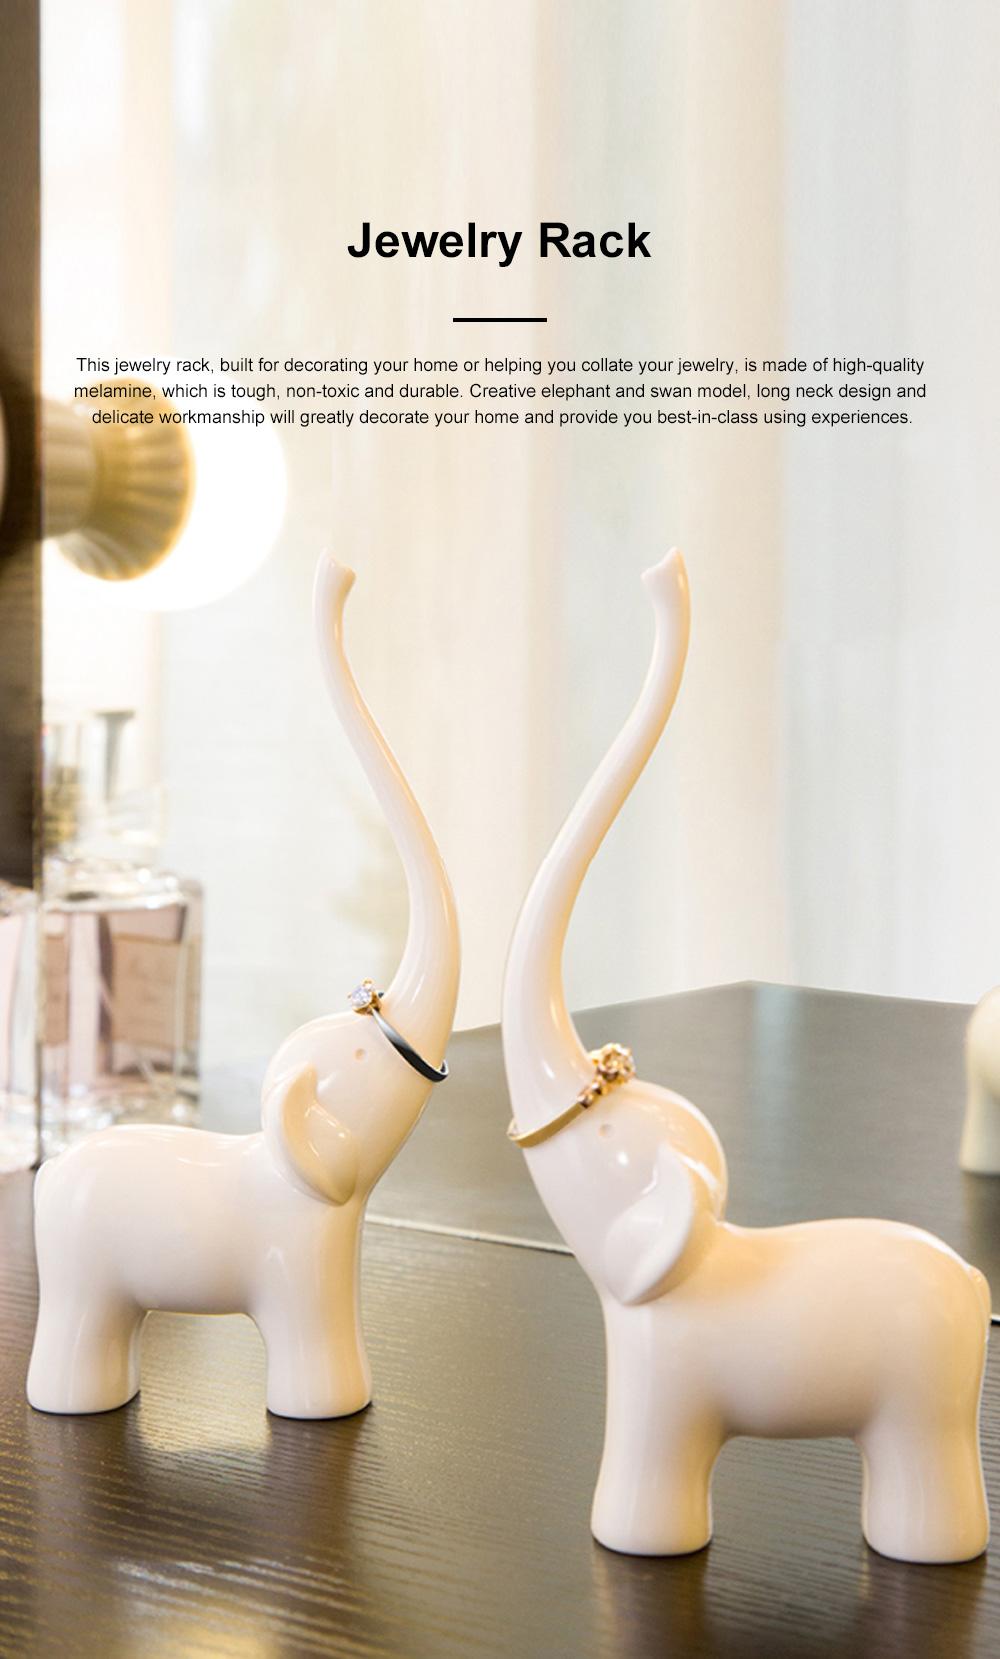 Creative Cute Elephant Swan Model Melamine Jewelry Rack Necklace Rings Storage Household Ornament Decoration 0